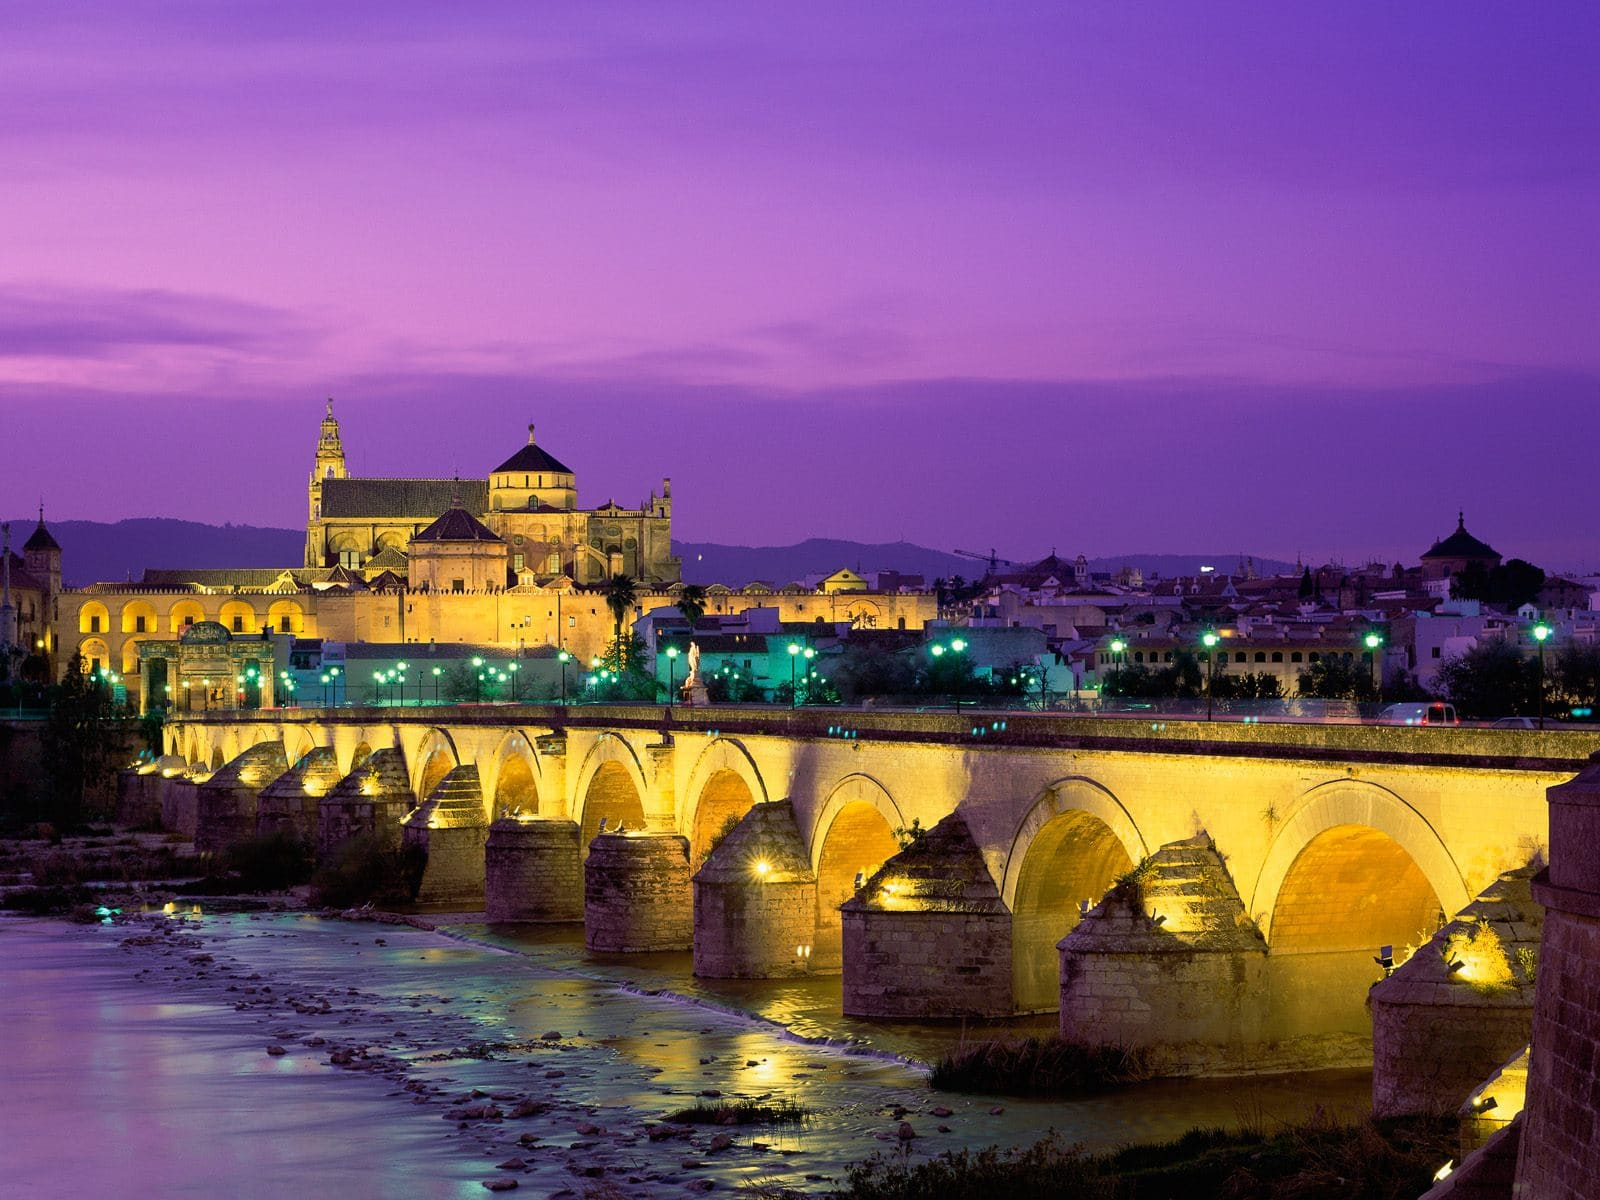 Marea Moschee din Cordoba, Spania